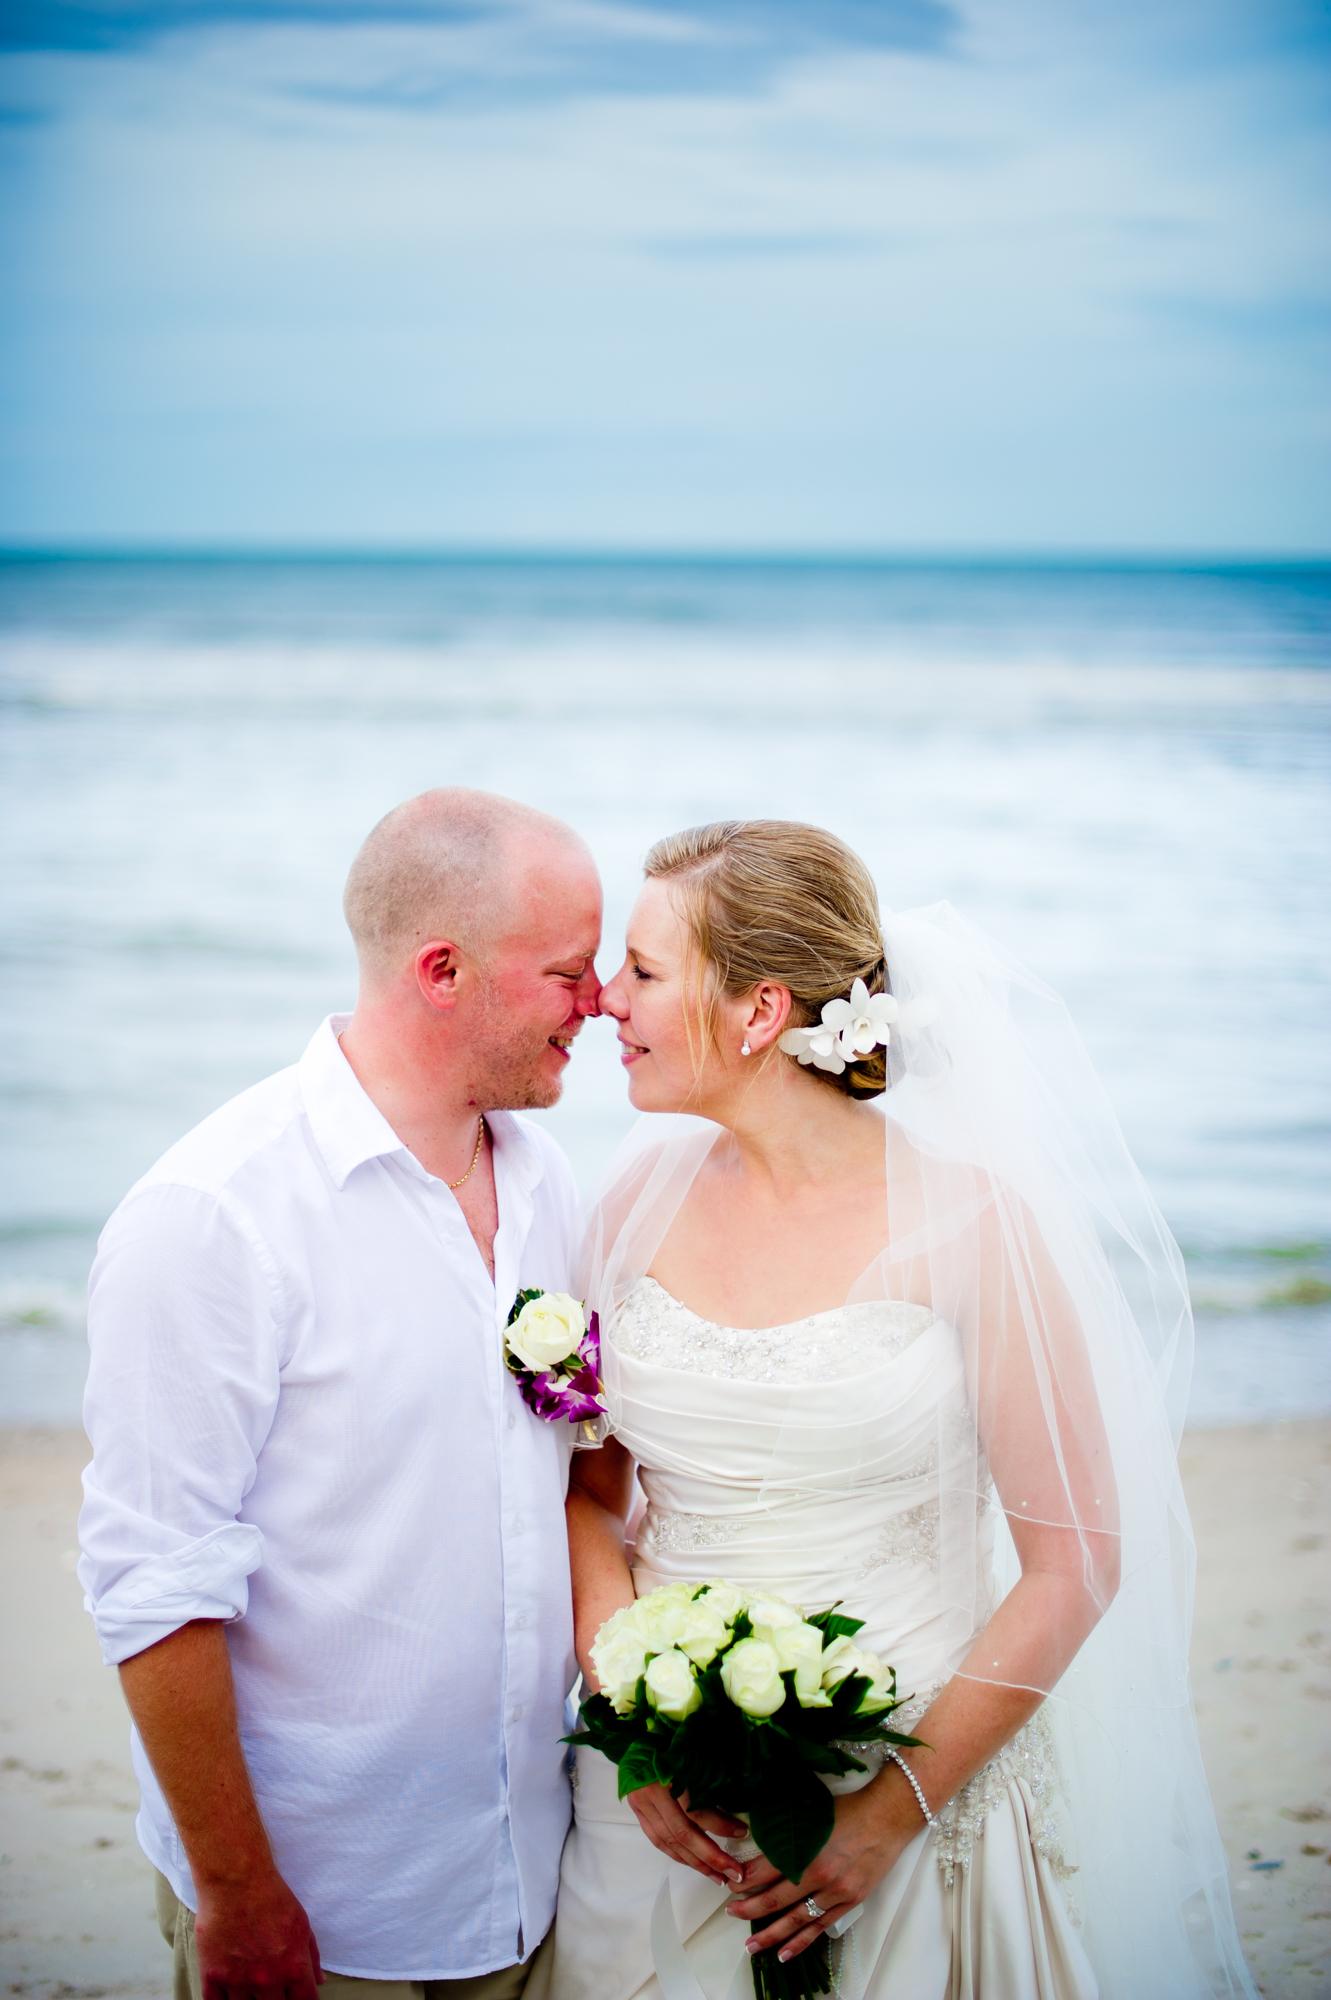 Hua Hin Thailand Wedding Photography - Anantara Hua Hin Resort & Spa